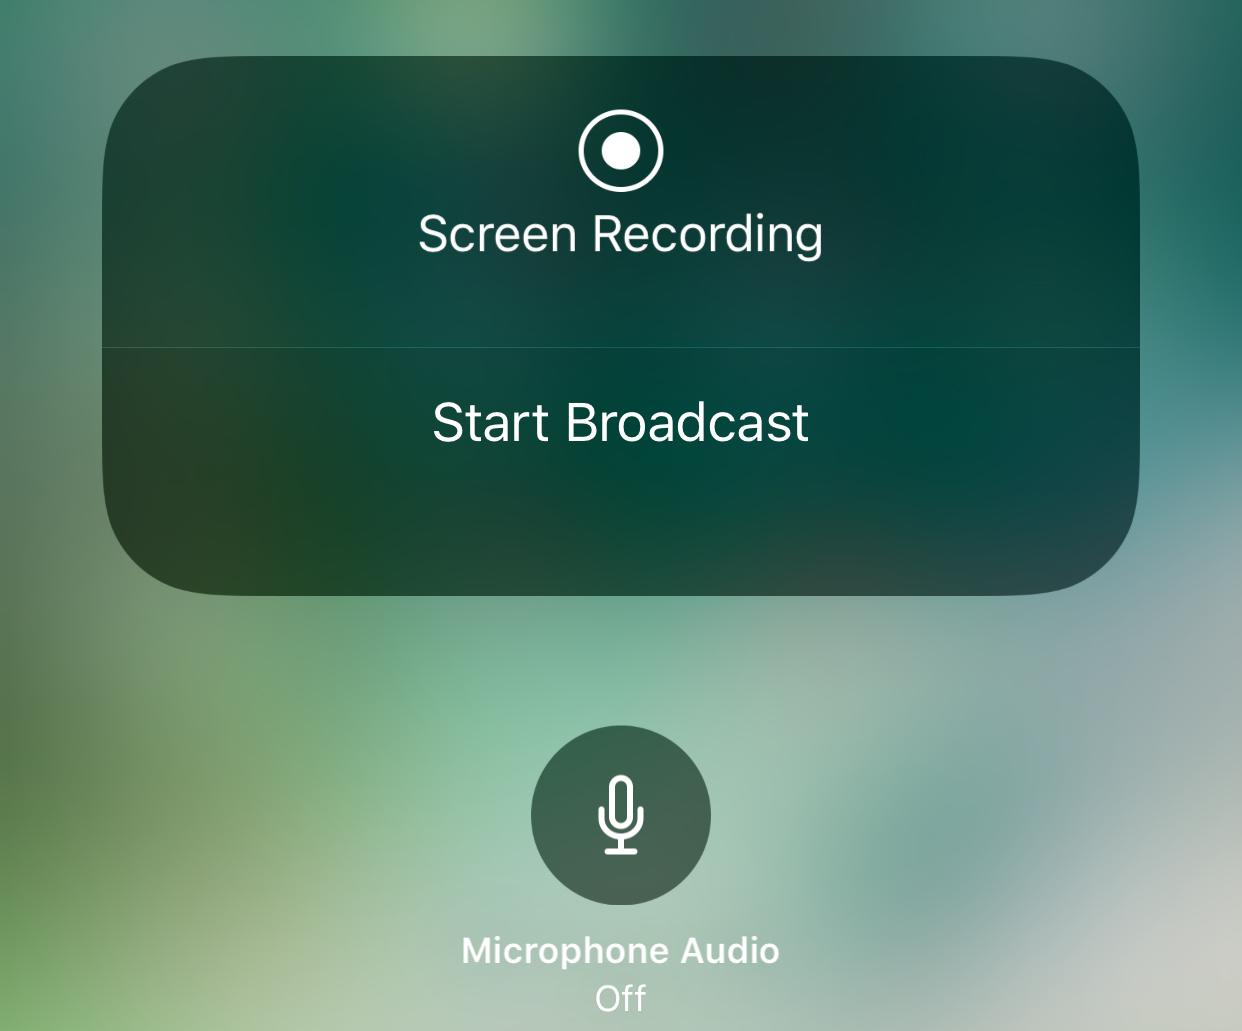 iOS 11 Screen Broadcast feature